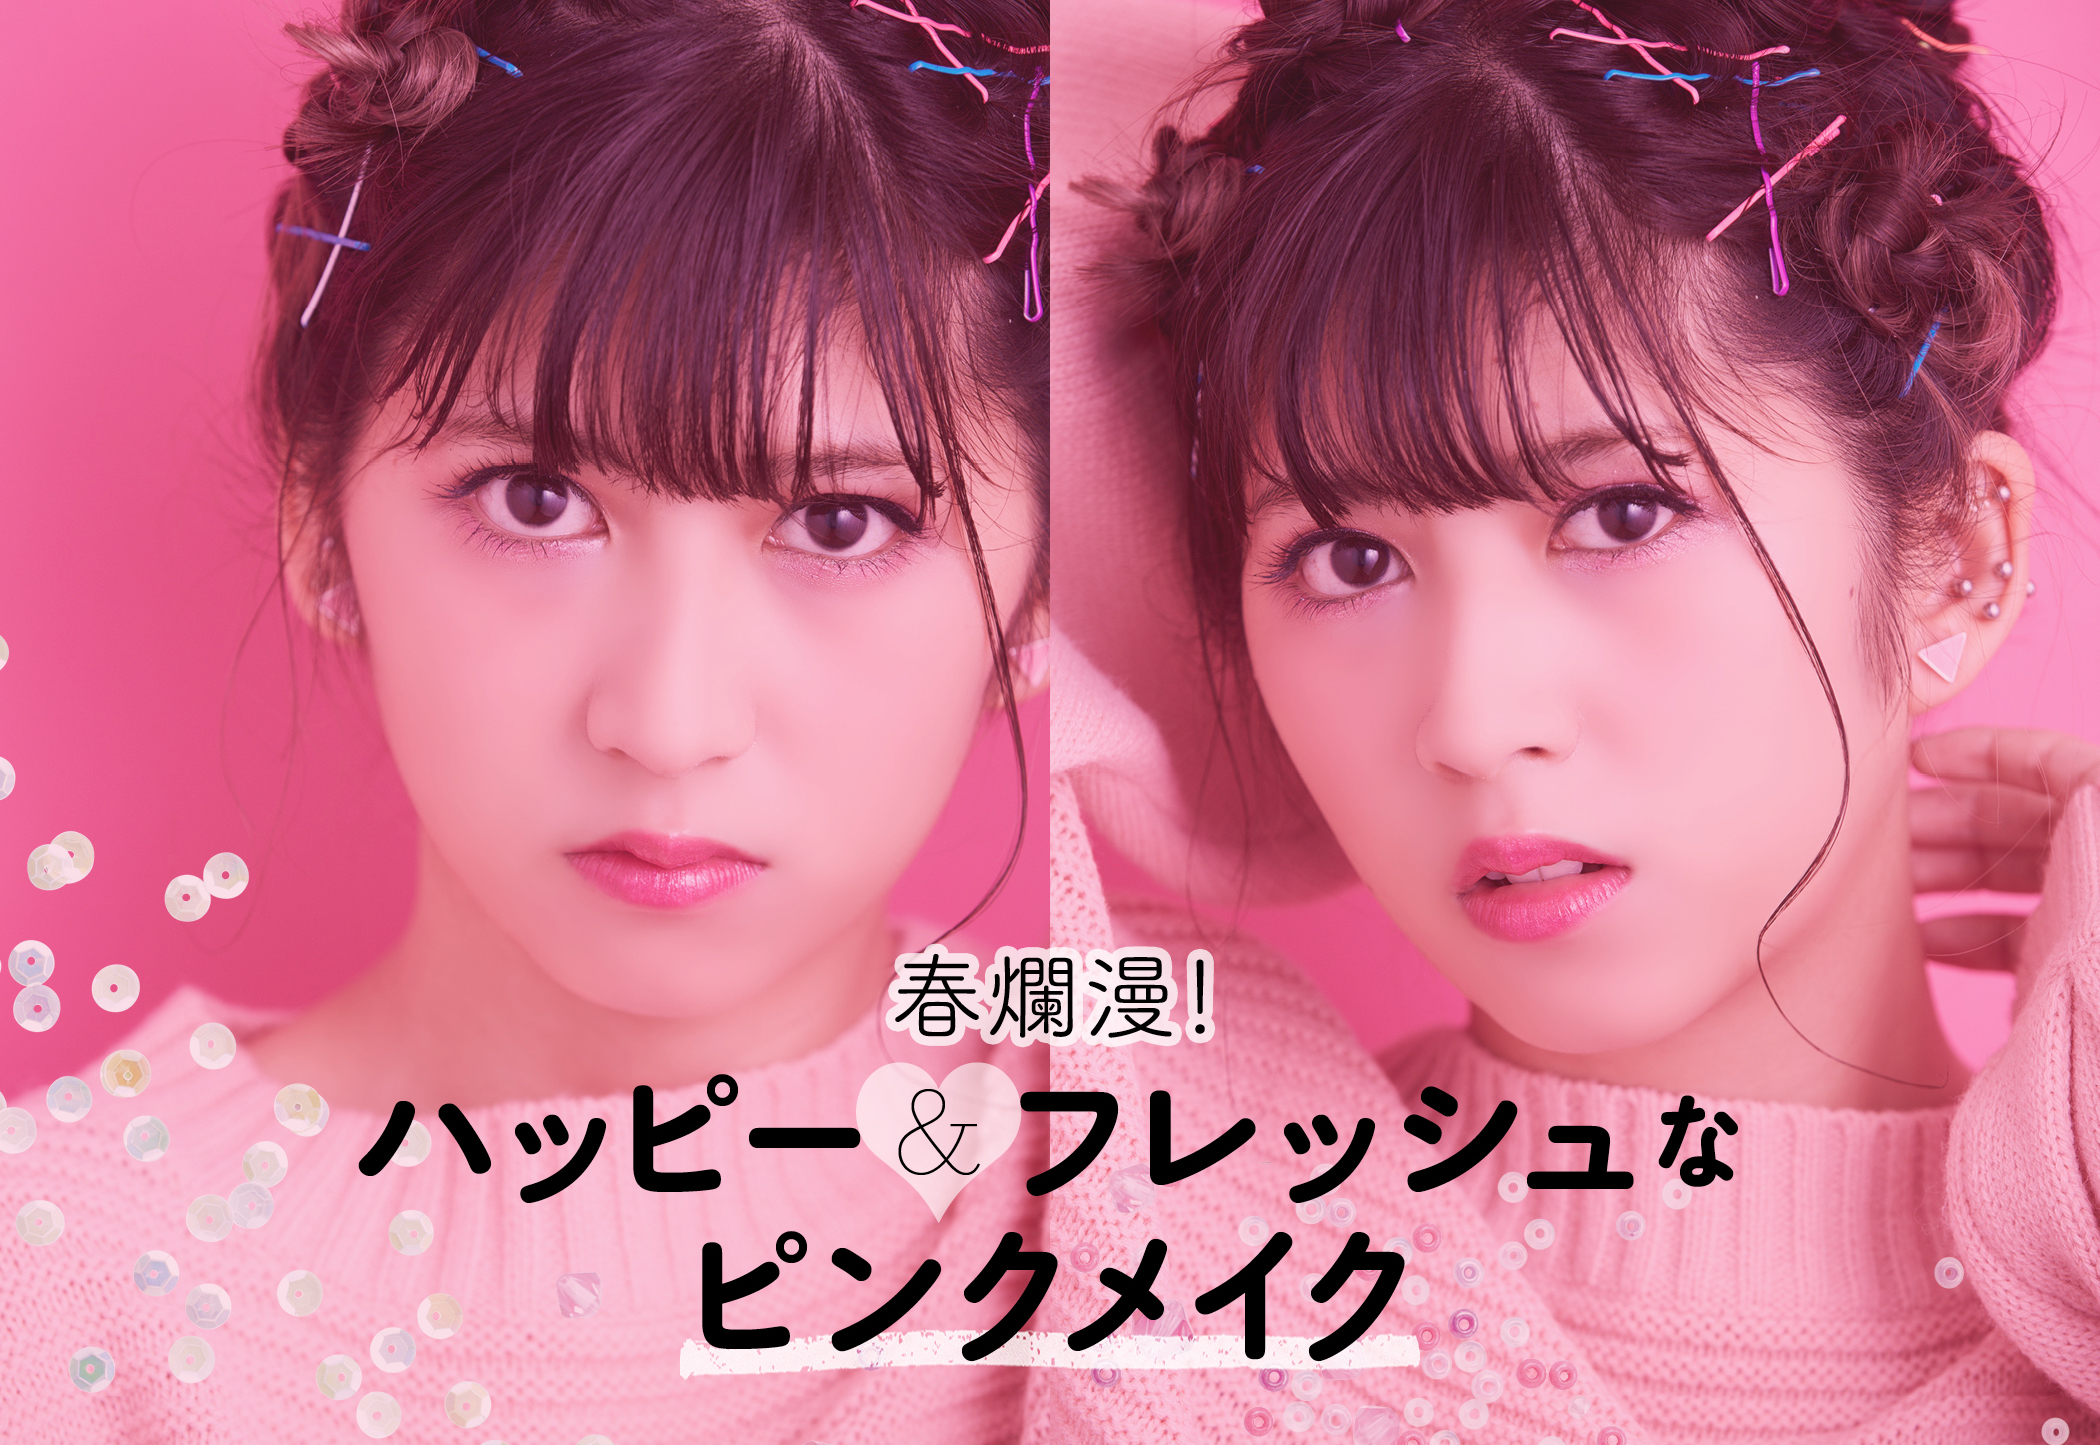 【Nom de BEAUTY】春爛漫! ハッピー&フレッシュなピンクメイク